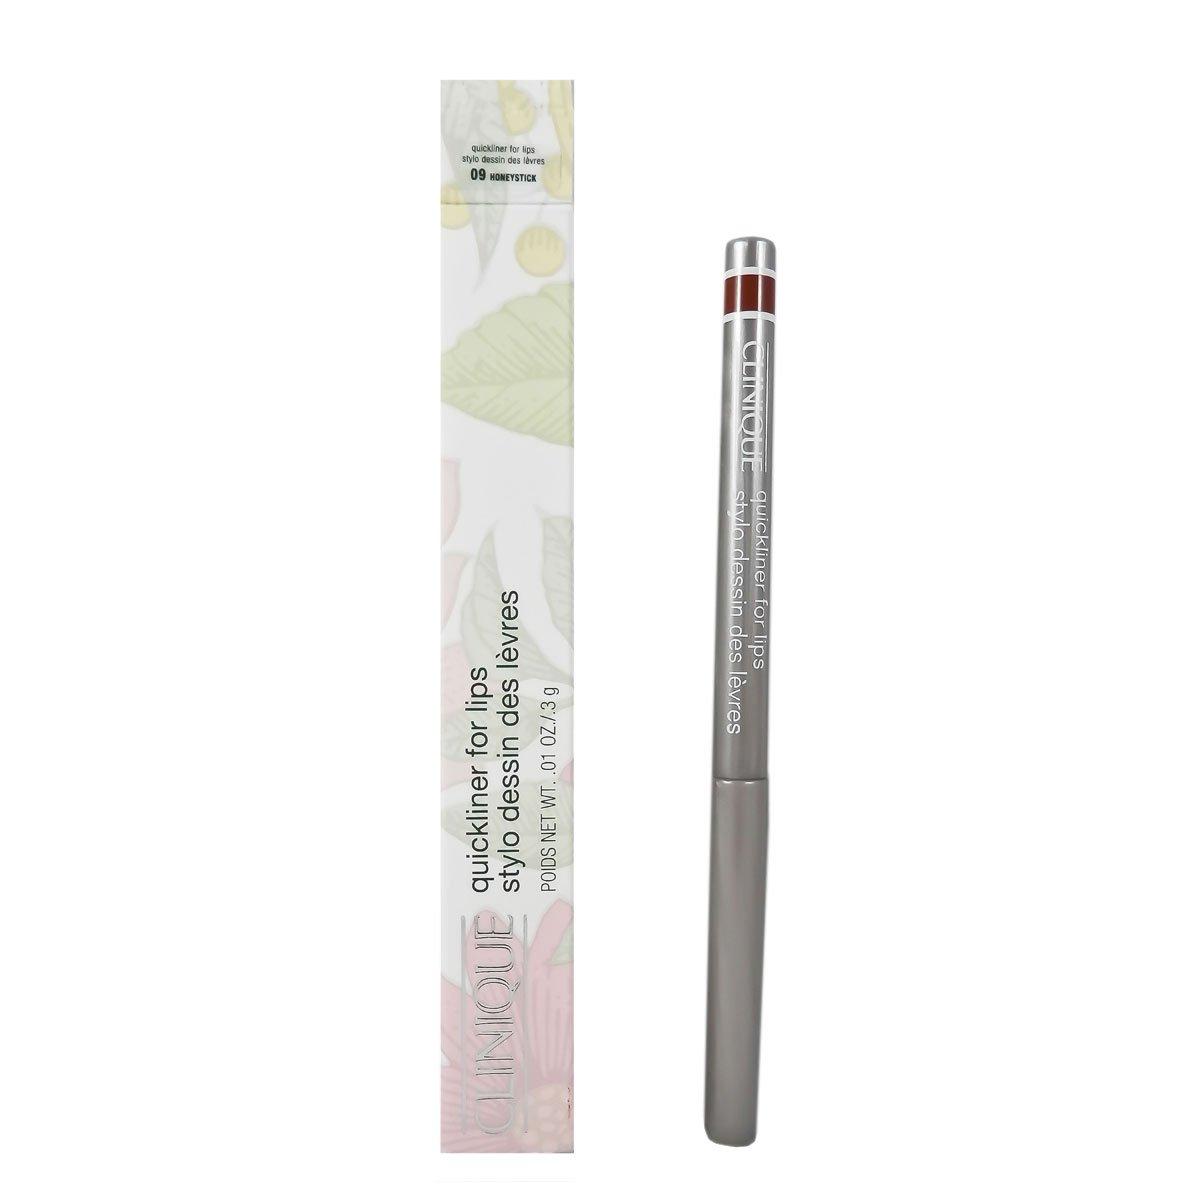 Clinique Quick Lip Liner for Women, No. 09 Honeystick, 0.01 Ounce